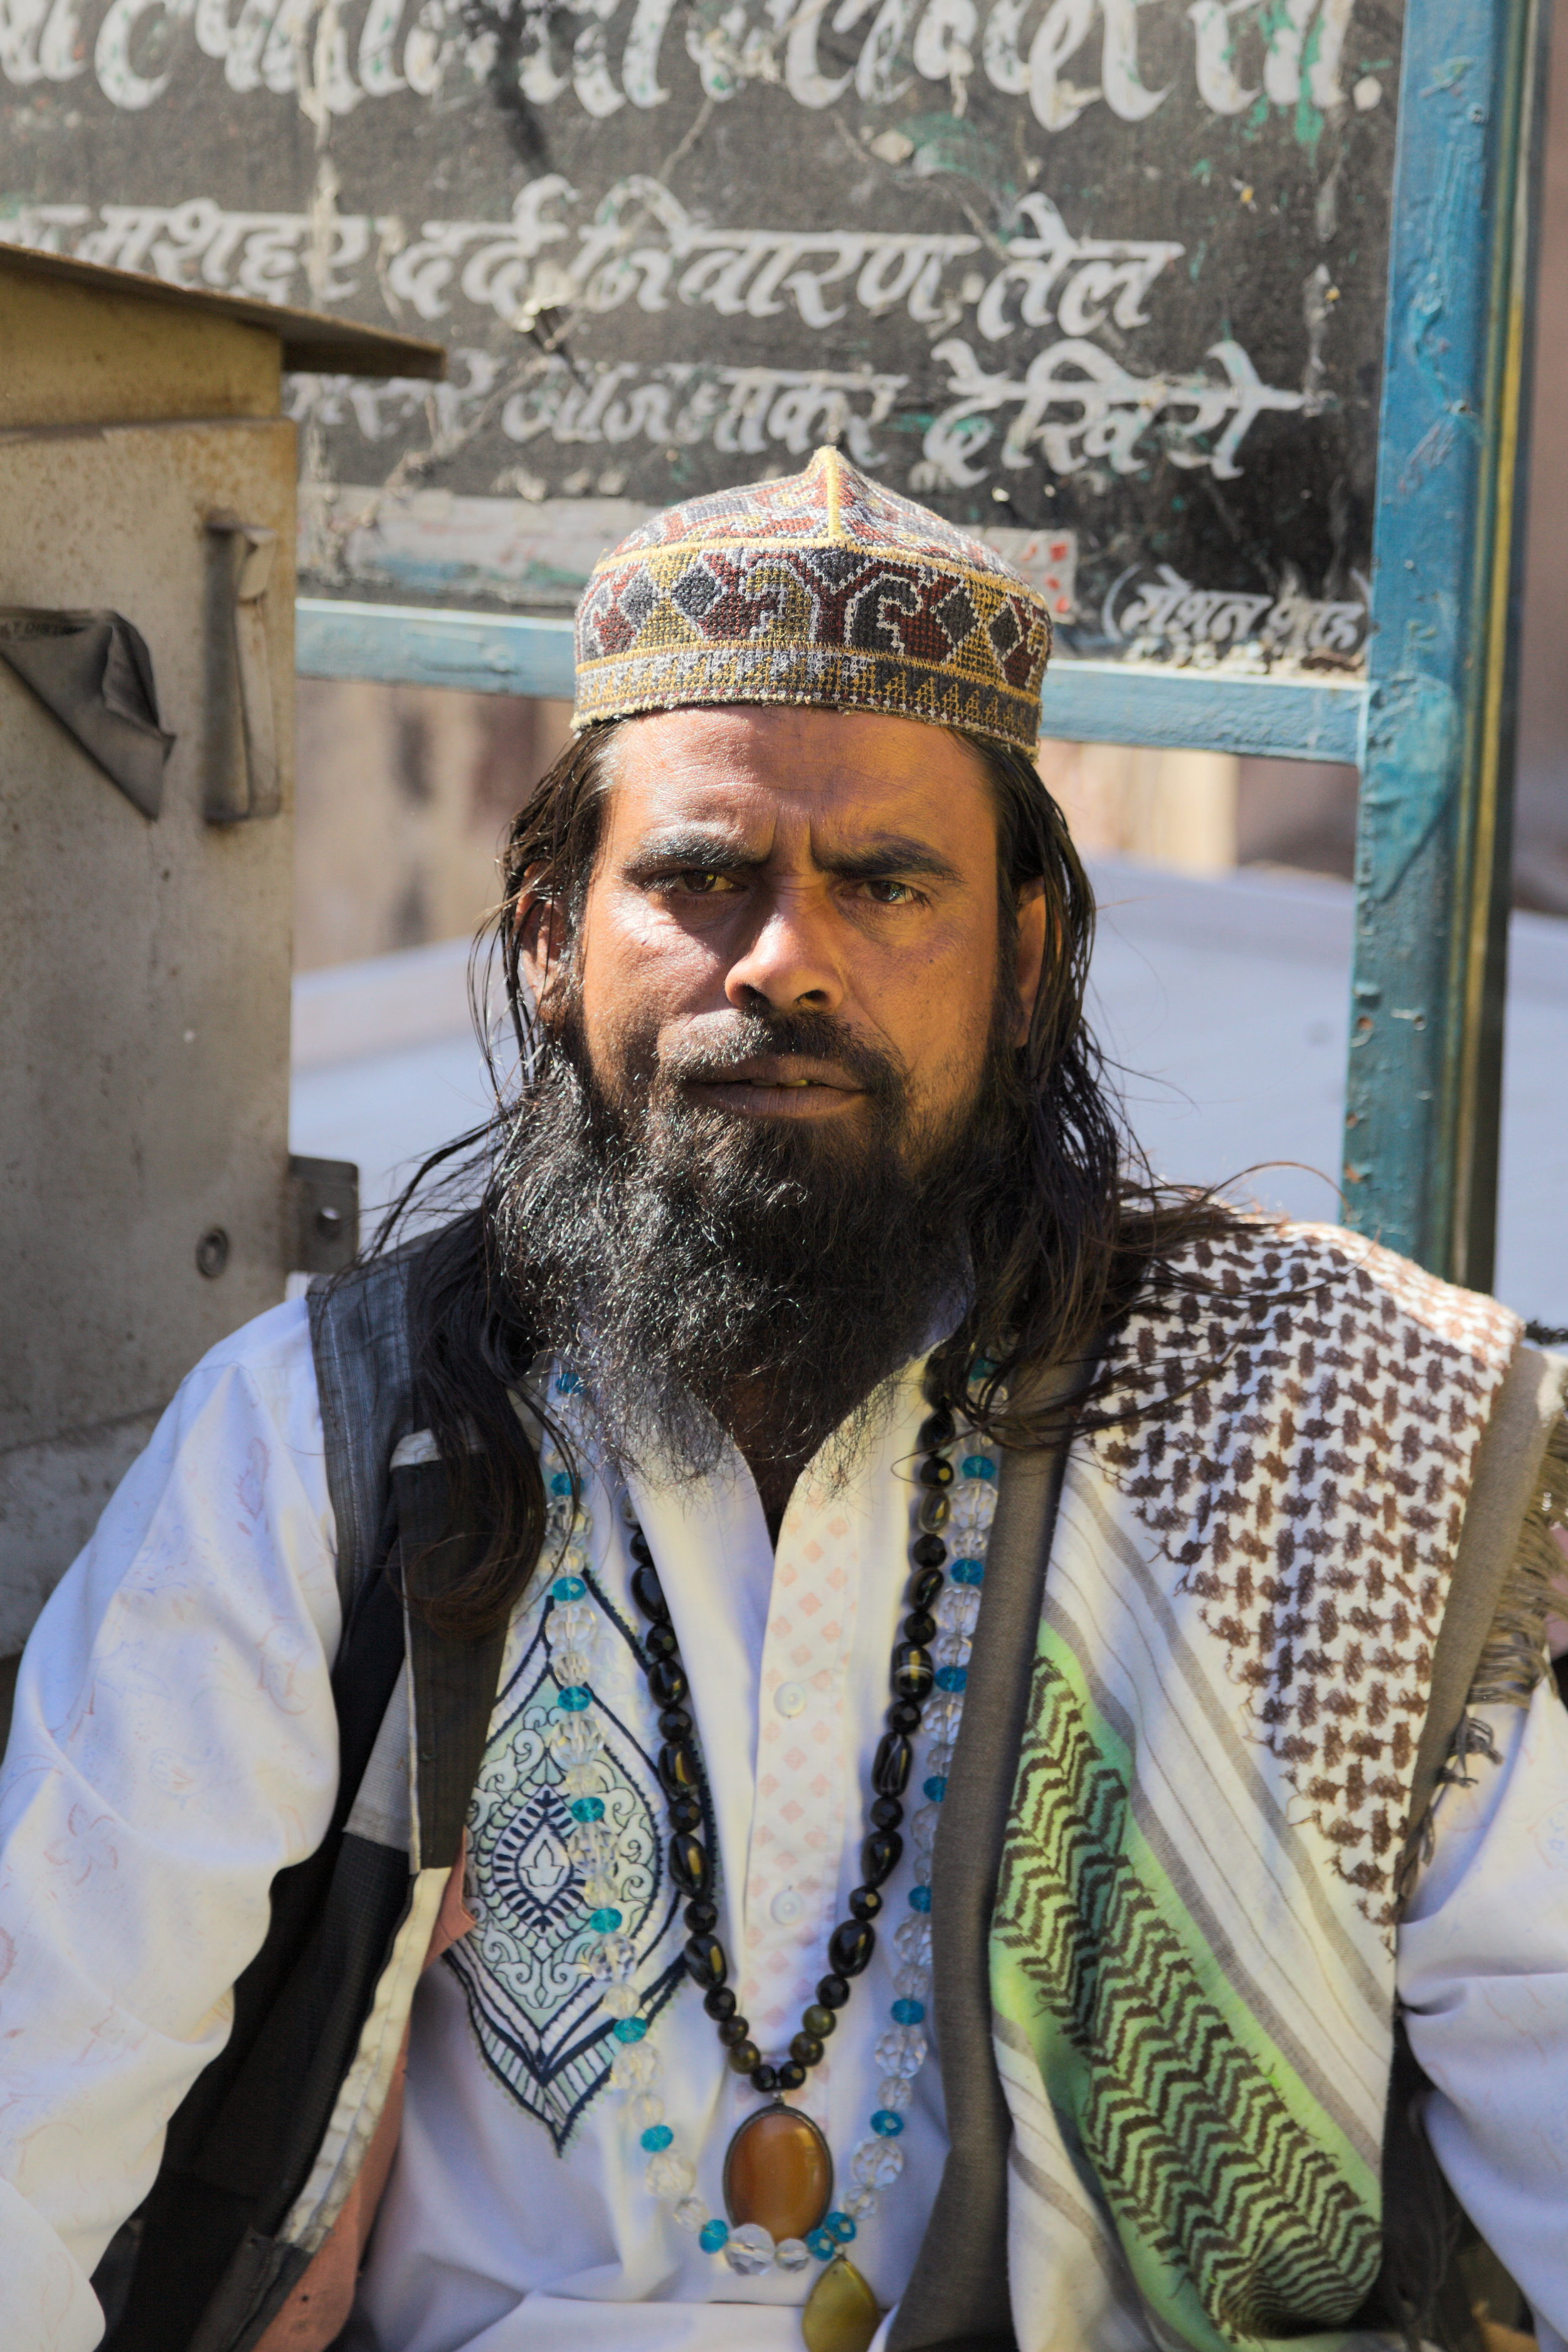 The keeper of a Sufi shrine in Bikaner, Rajasthan